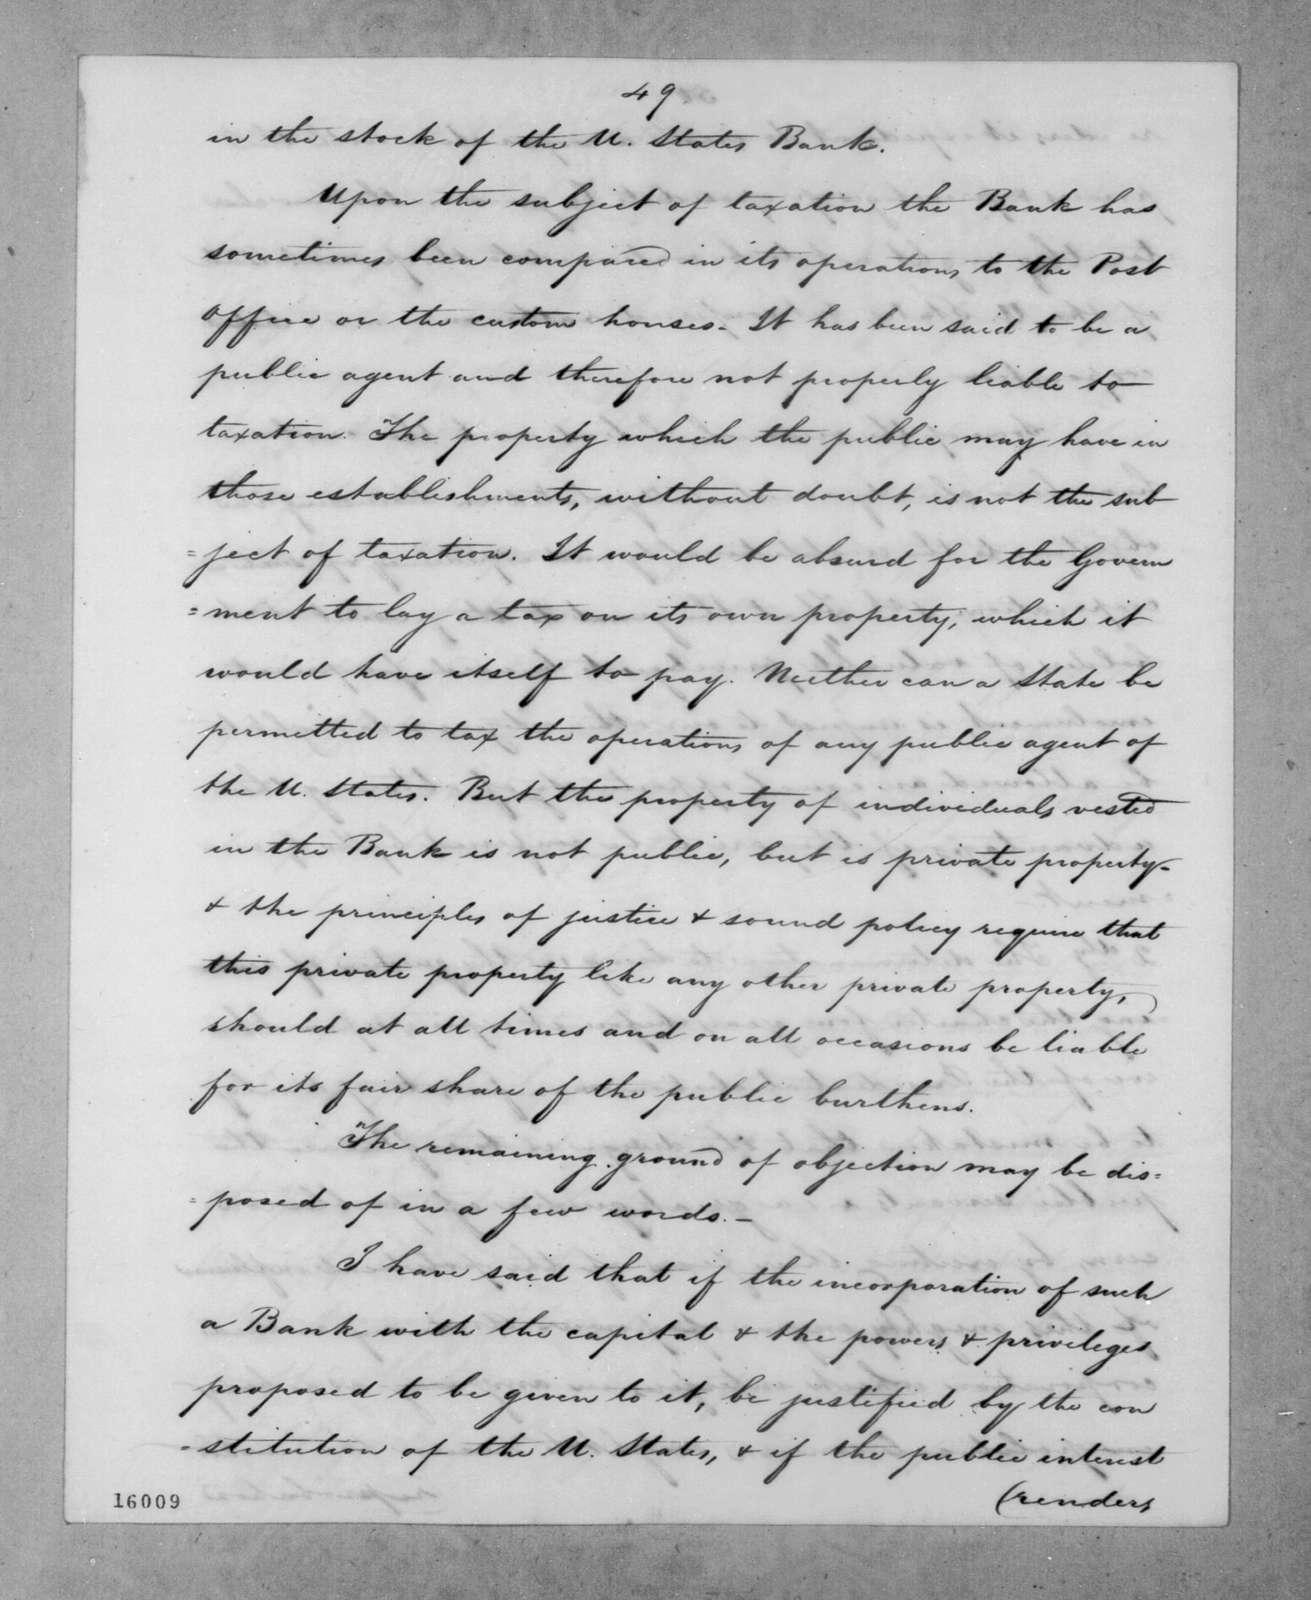 Roger Brooke Taney to Andrew Jackson, June 27, 1832